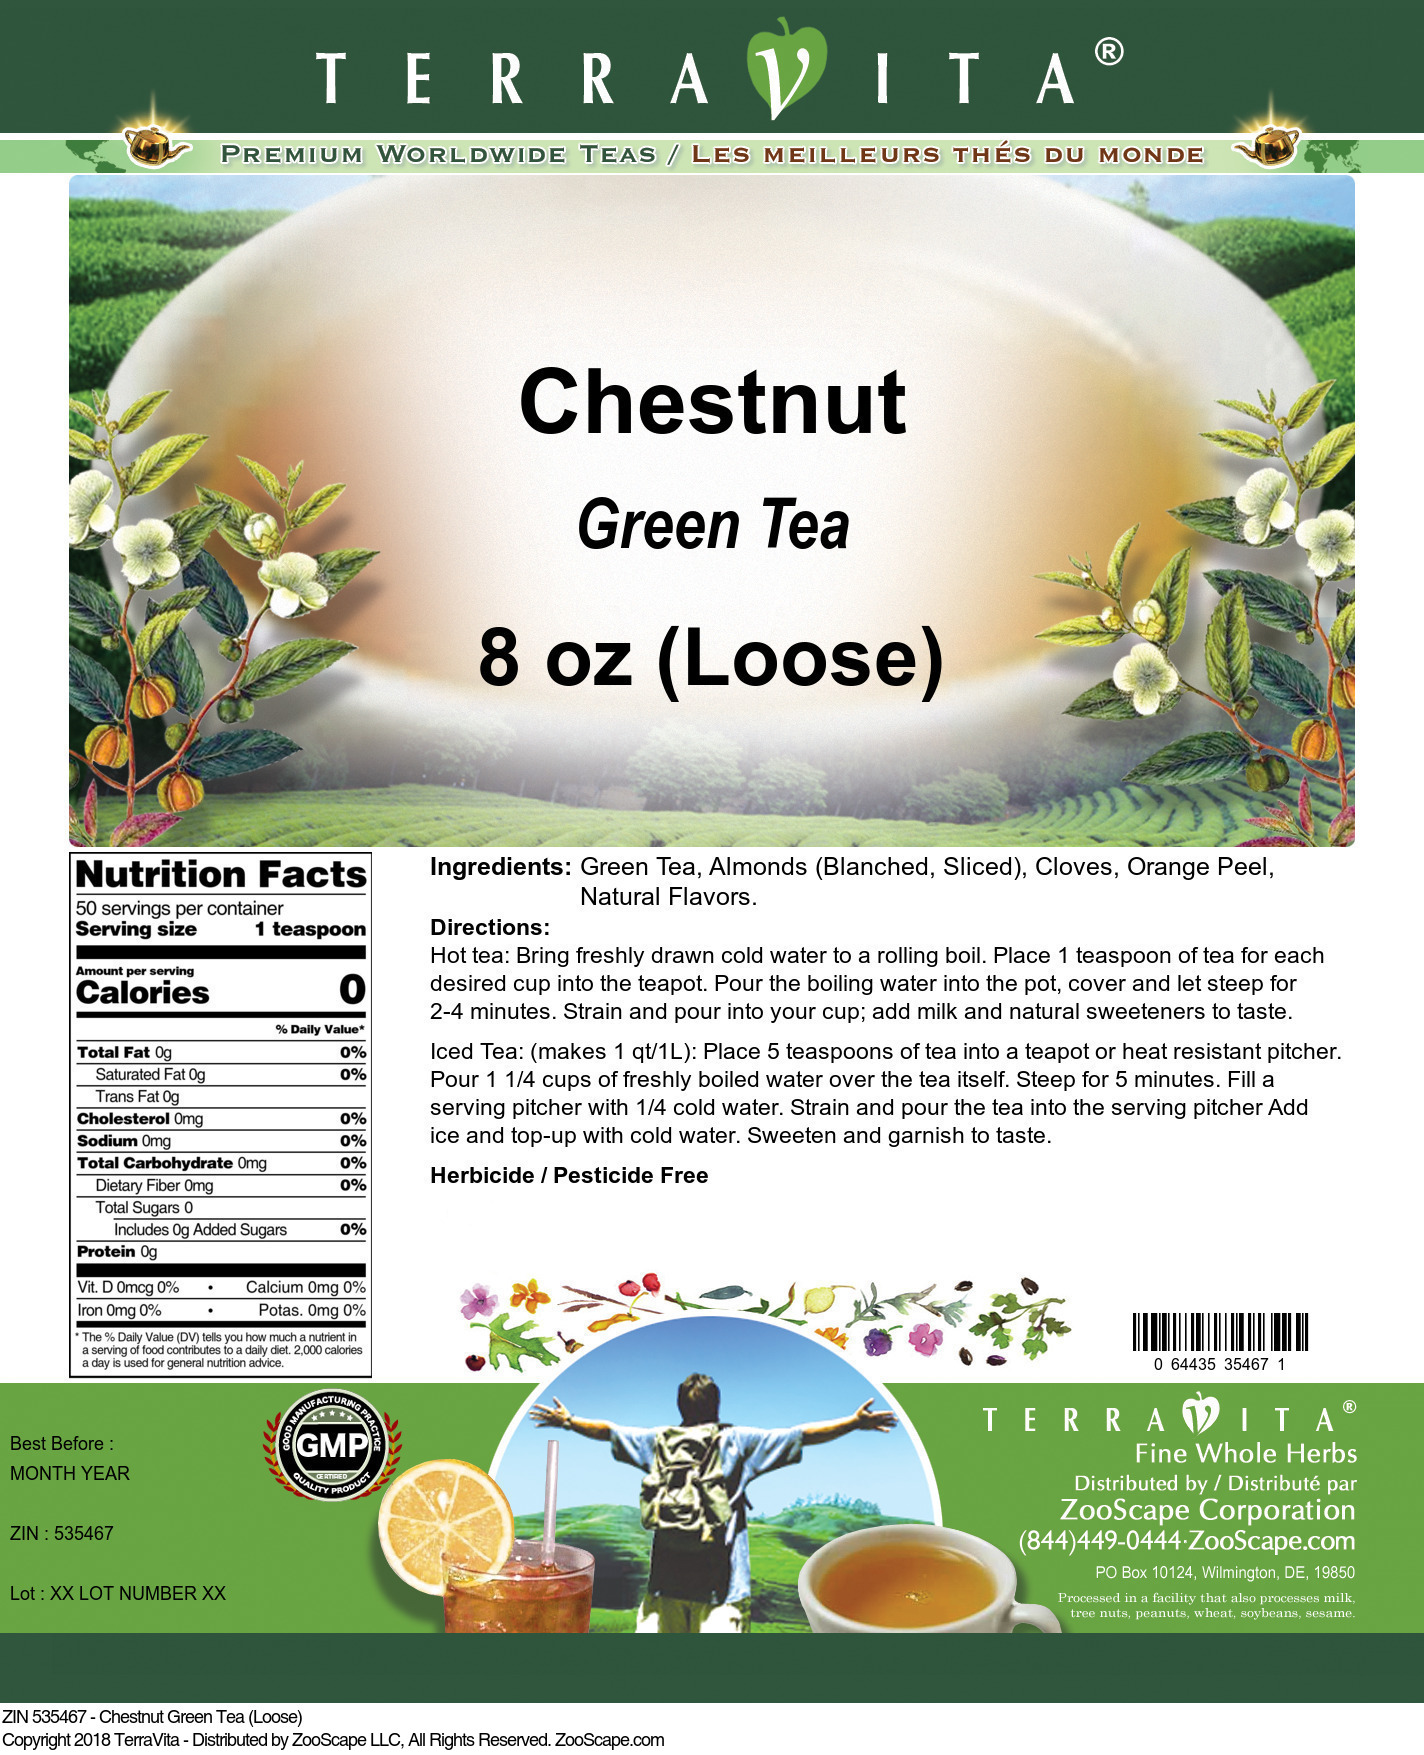 Chestnut Green Tea